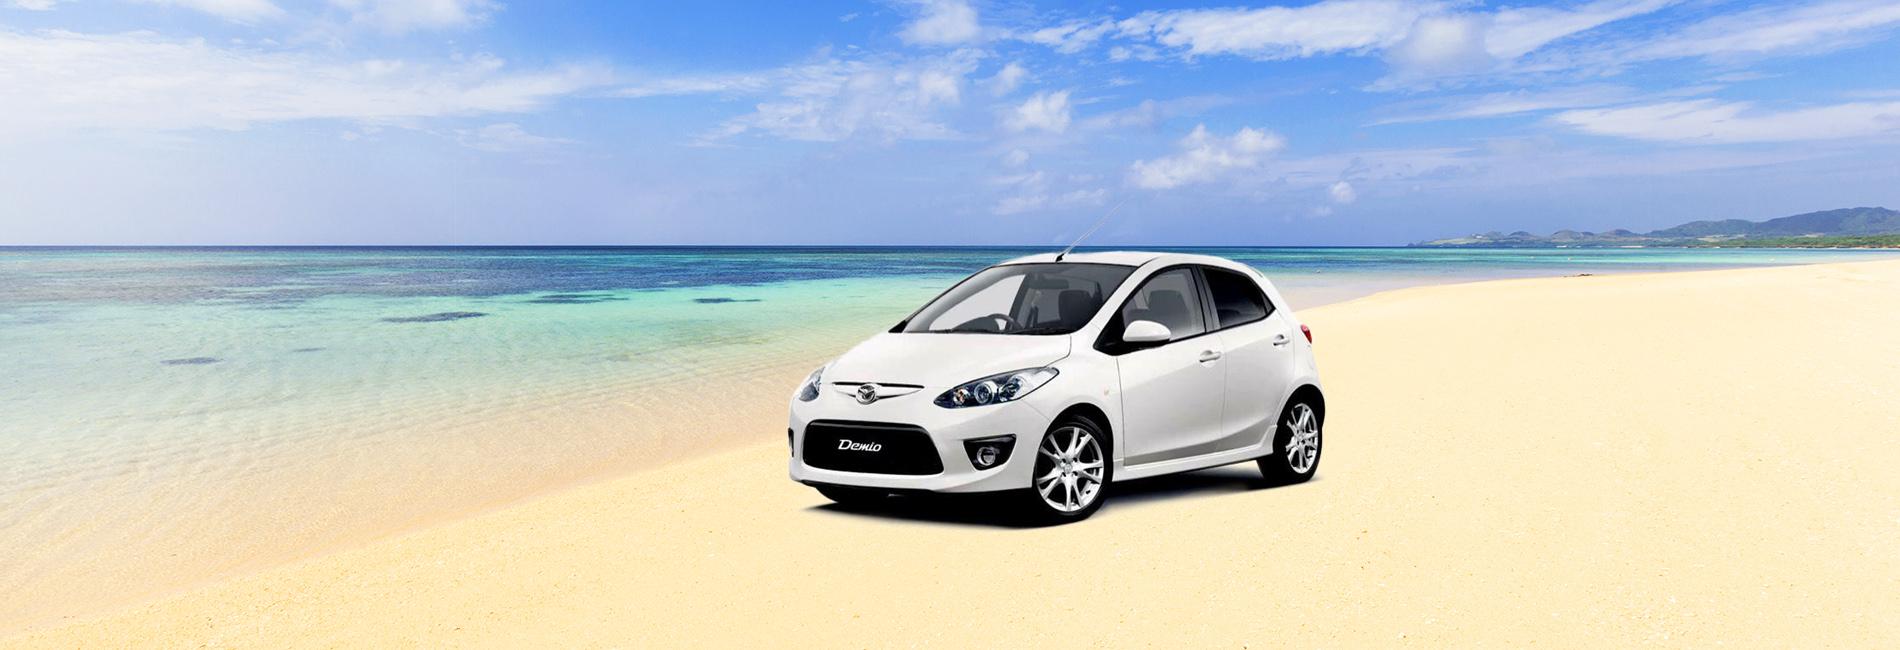 Ishigaki Island and Miyako Island Car Rental (C1 5-seater) - KKday